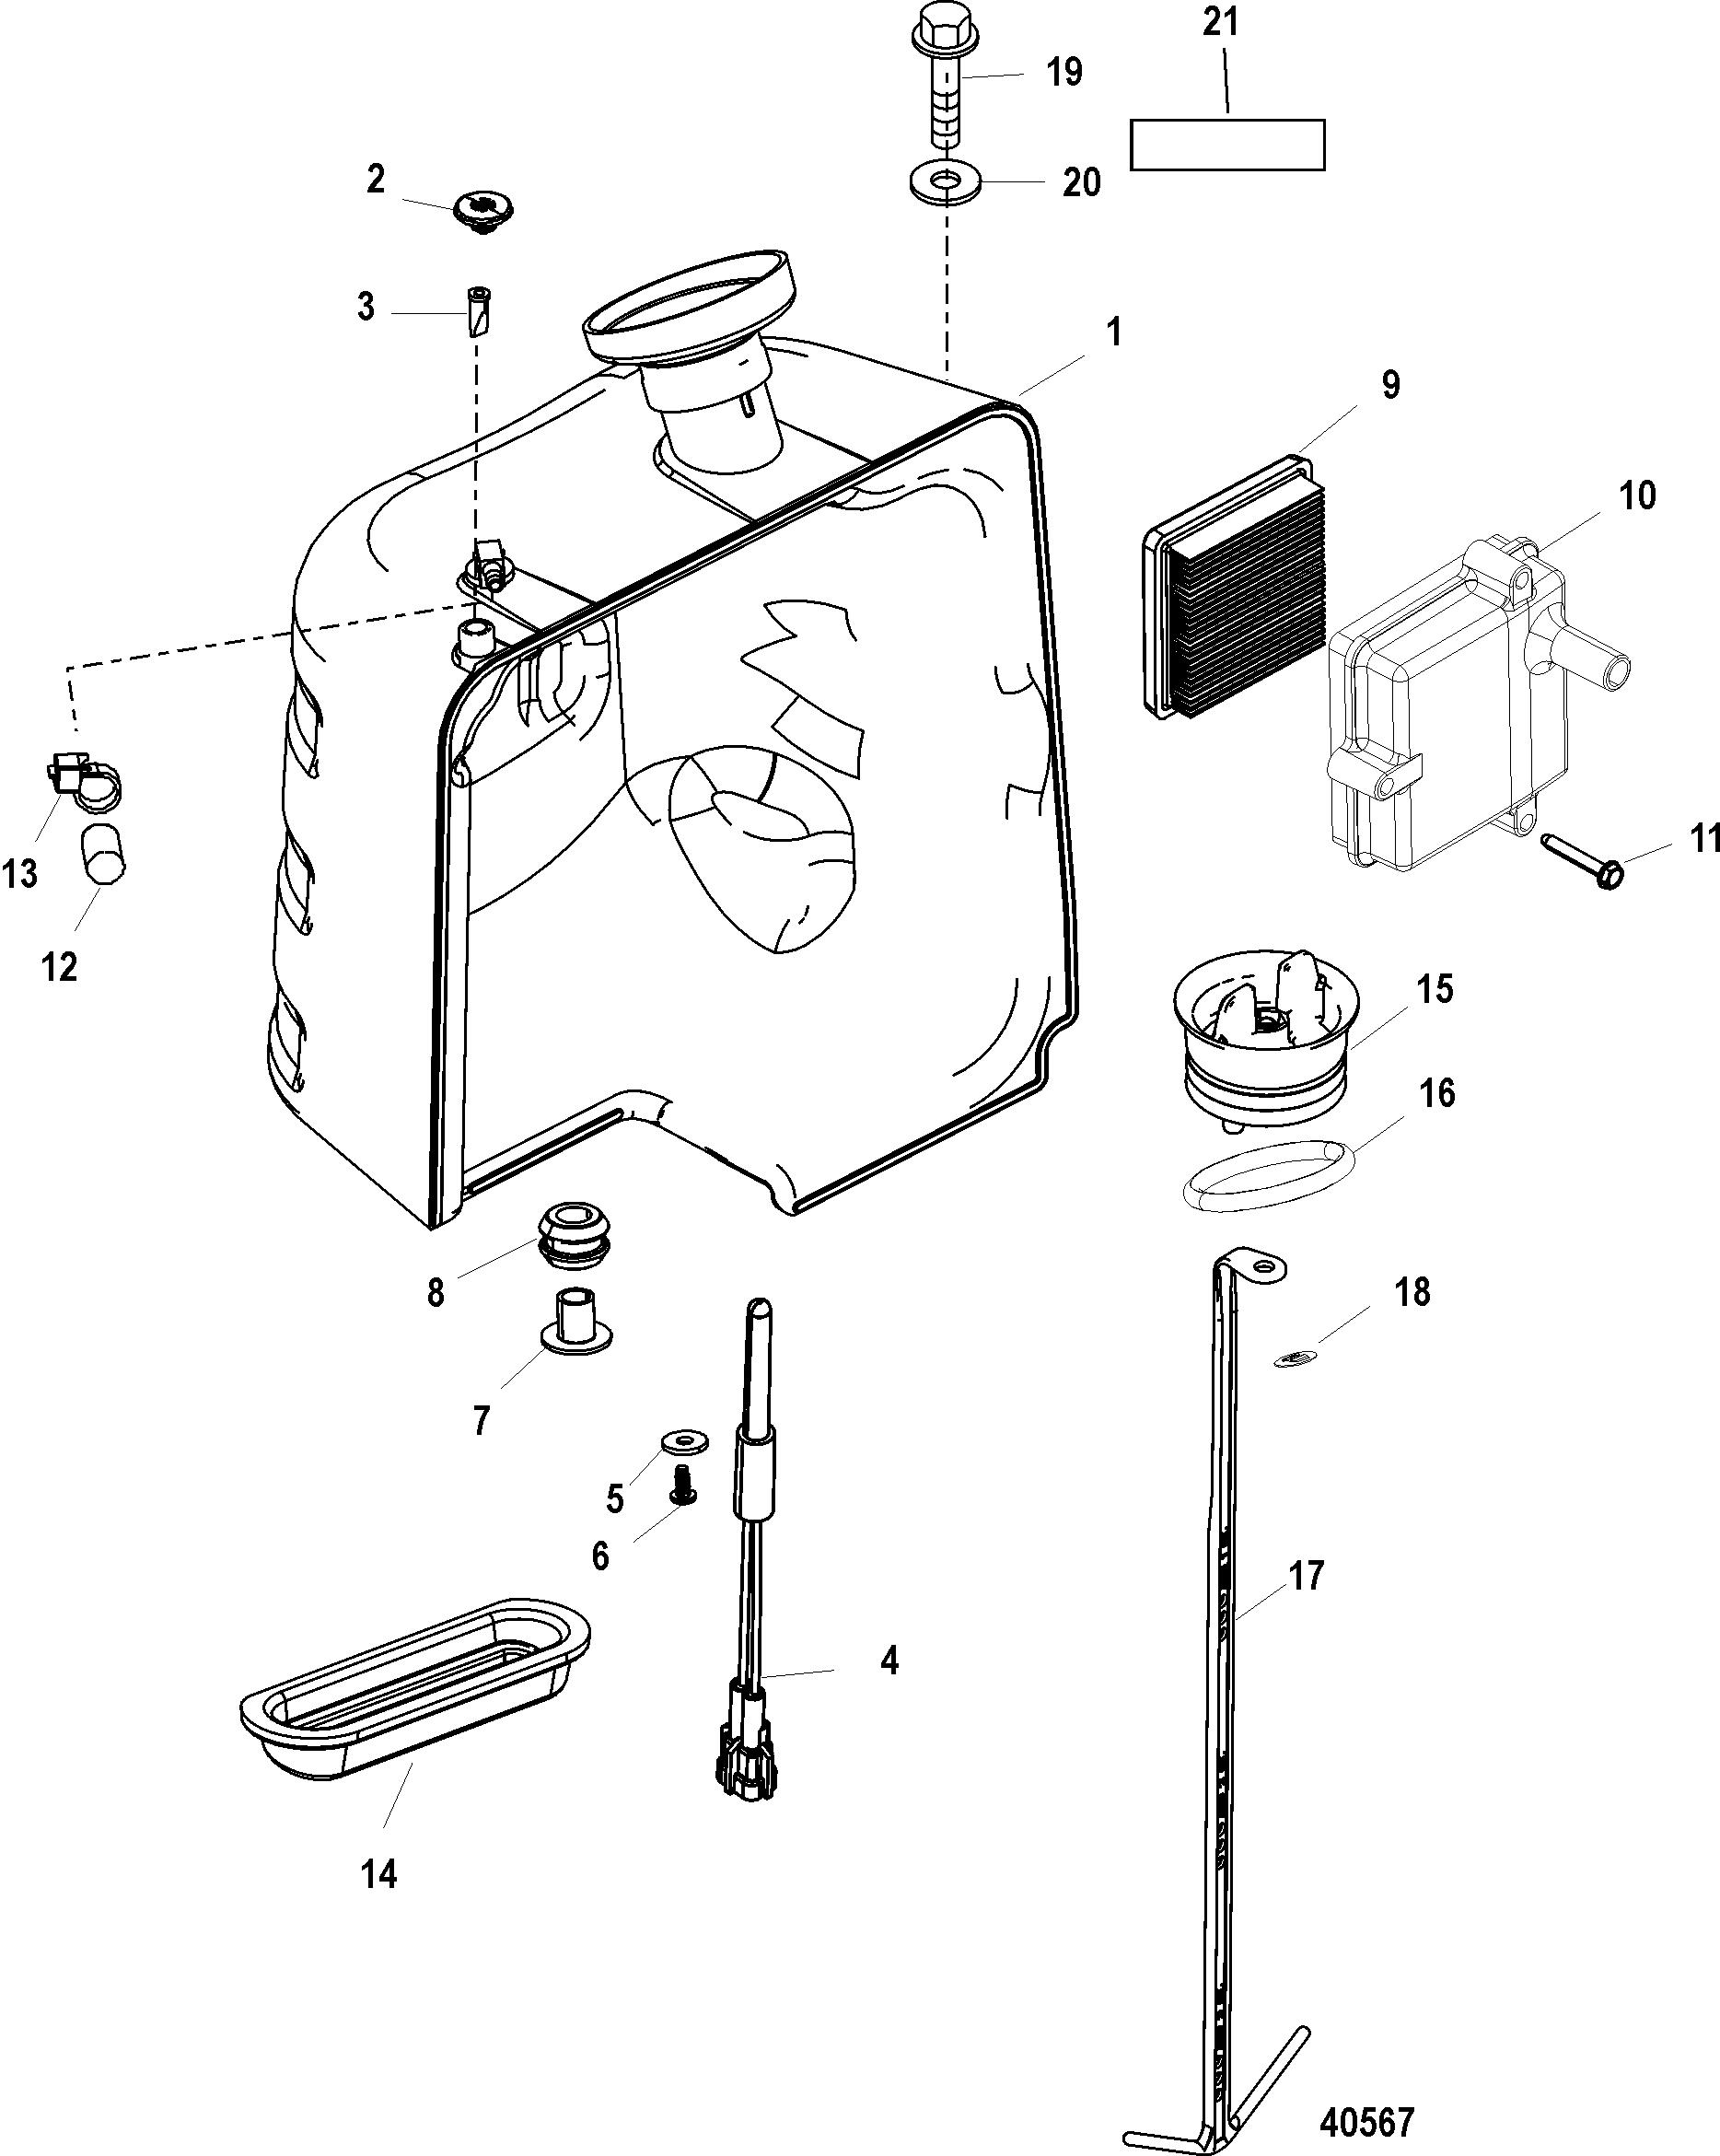 Oil Tank For Mercury 115 Pro Xs 1 5l